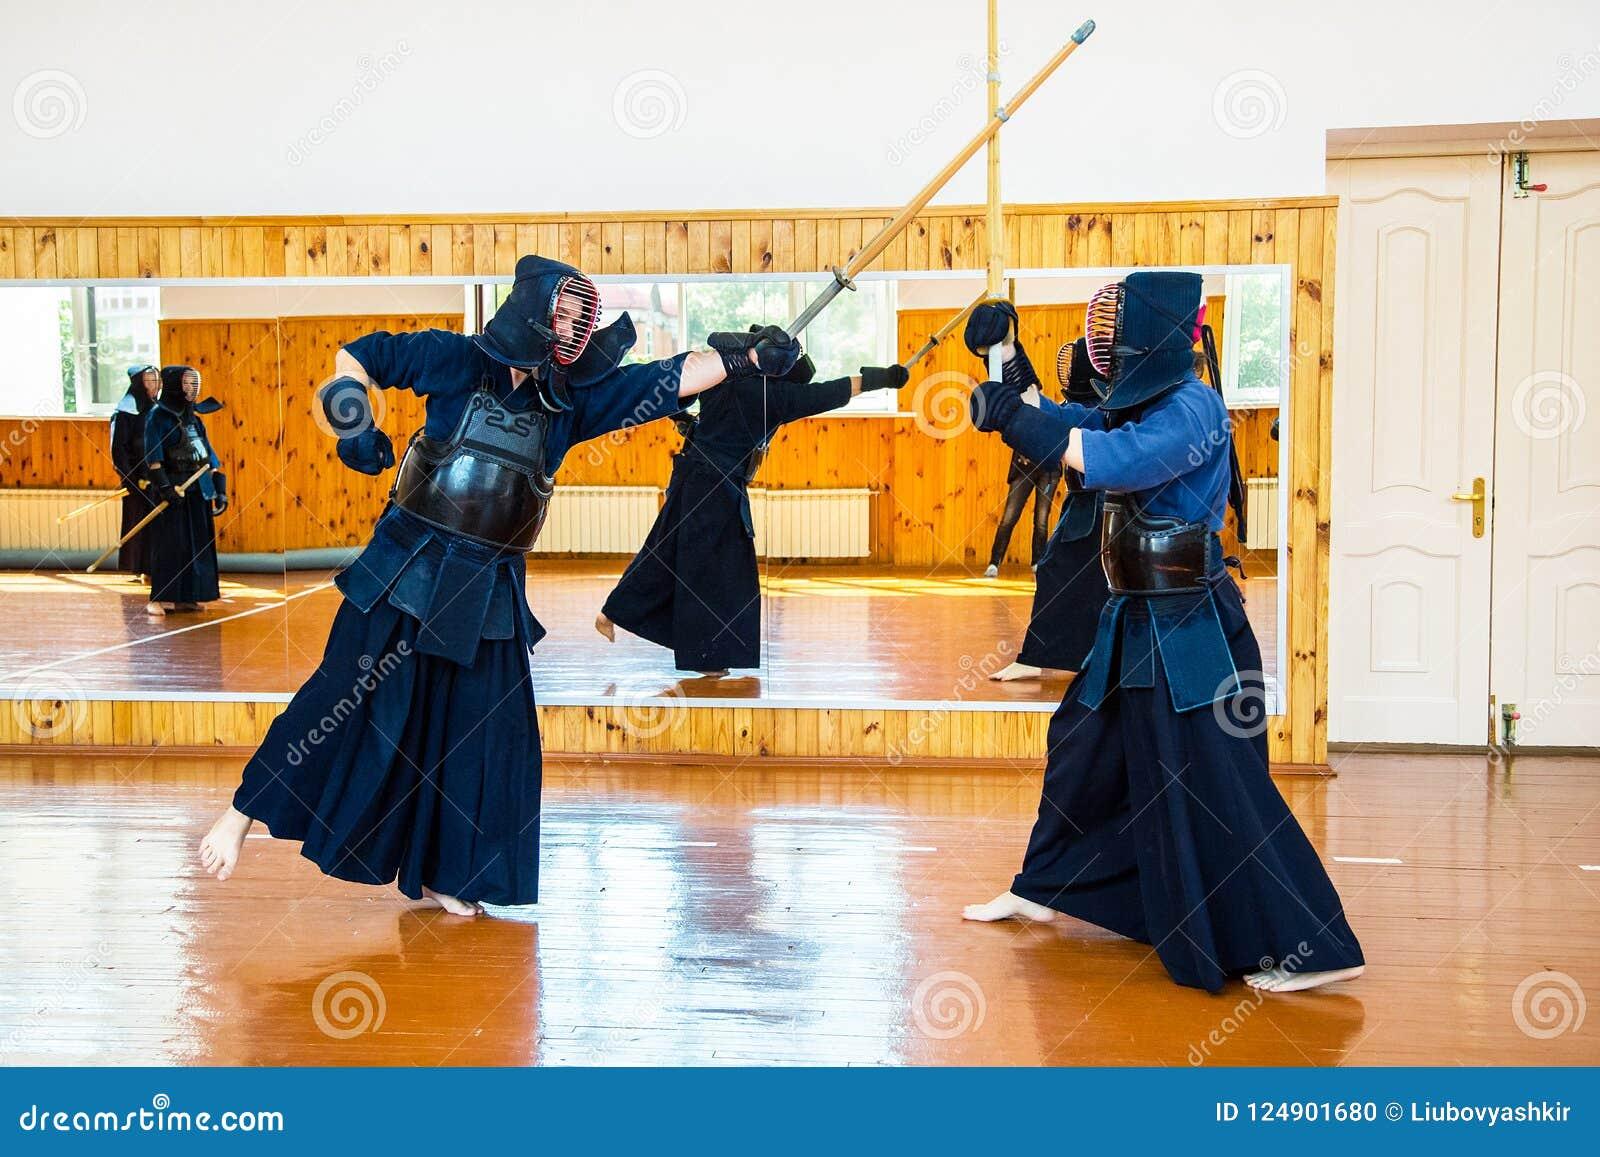 Japanese Martial Art Of Sword Fighting  Sport  Editorial